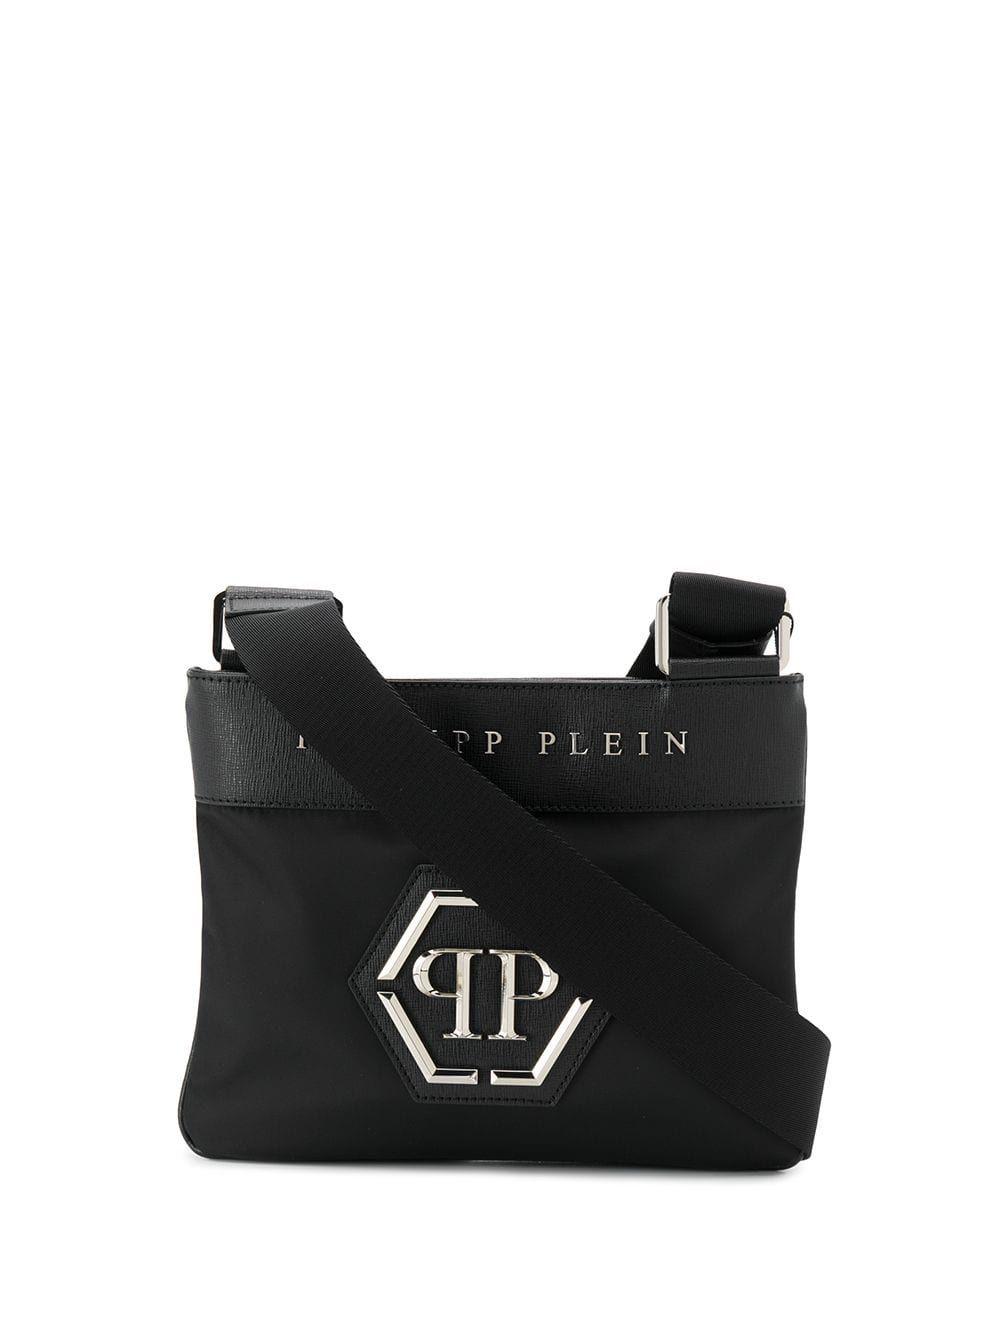 78163b34b2 PHILIPP PLEIN PHILIPP PLEIN LOGO PLAQUE SHOULDER BAG - BLACK. #philippplein  #bags #